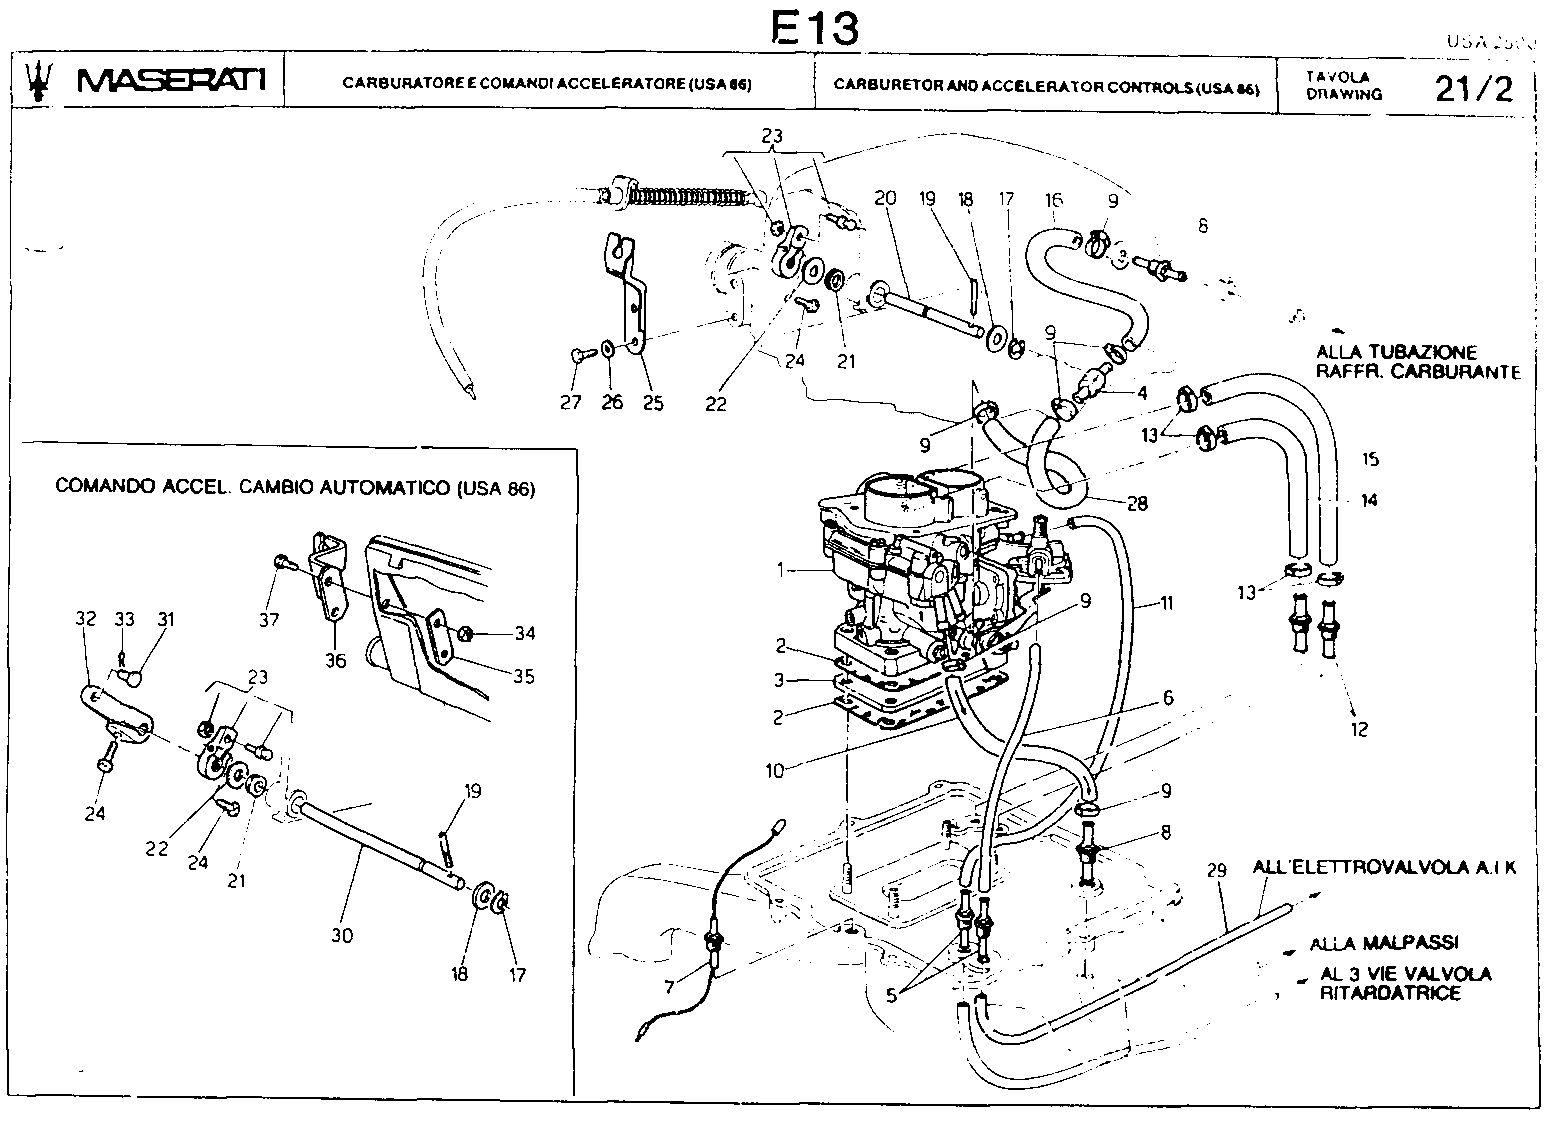 maserati spyder wiring diagram  maserati  auto wiring diagram